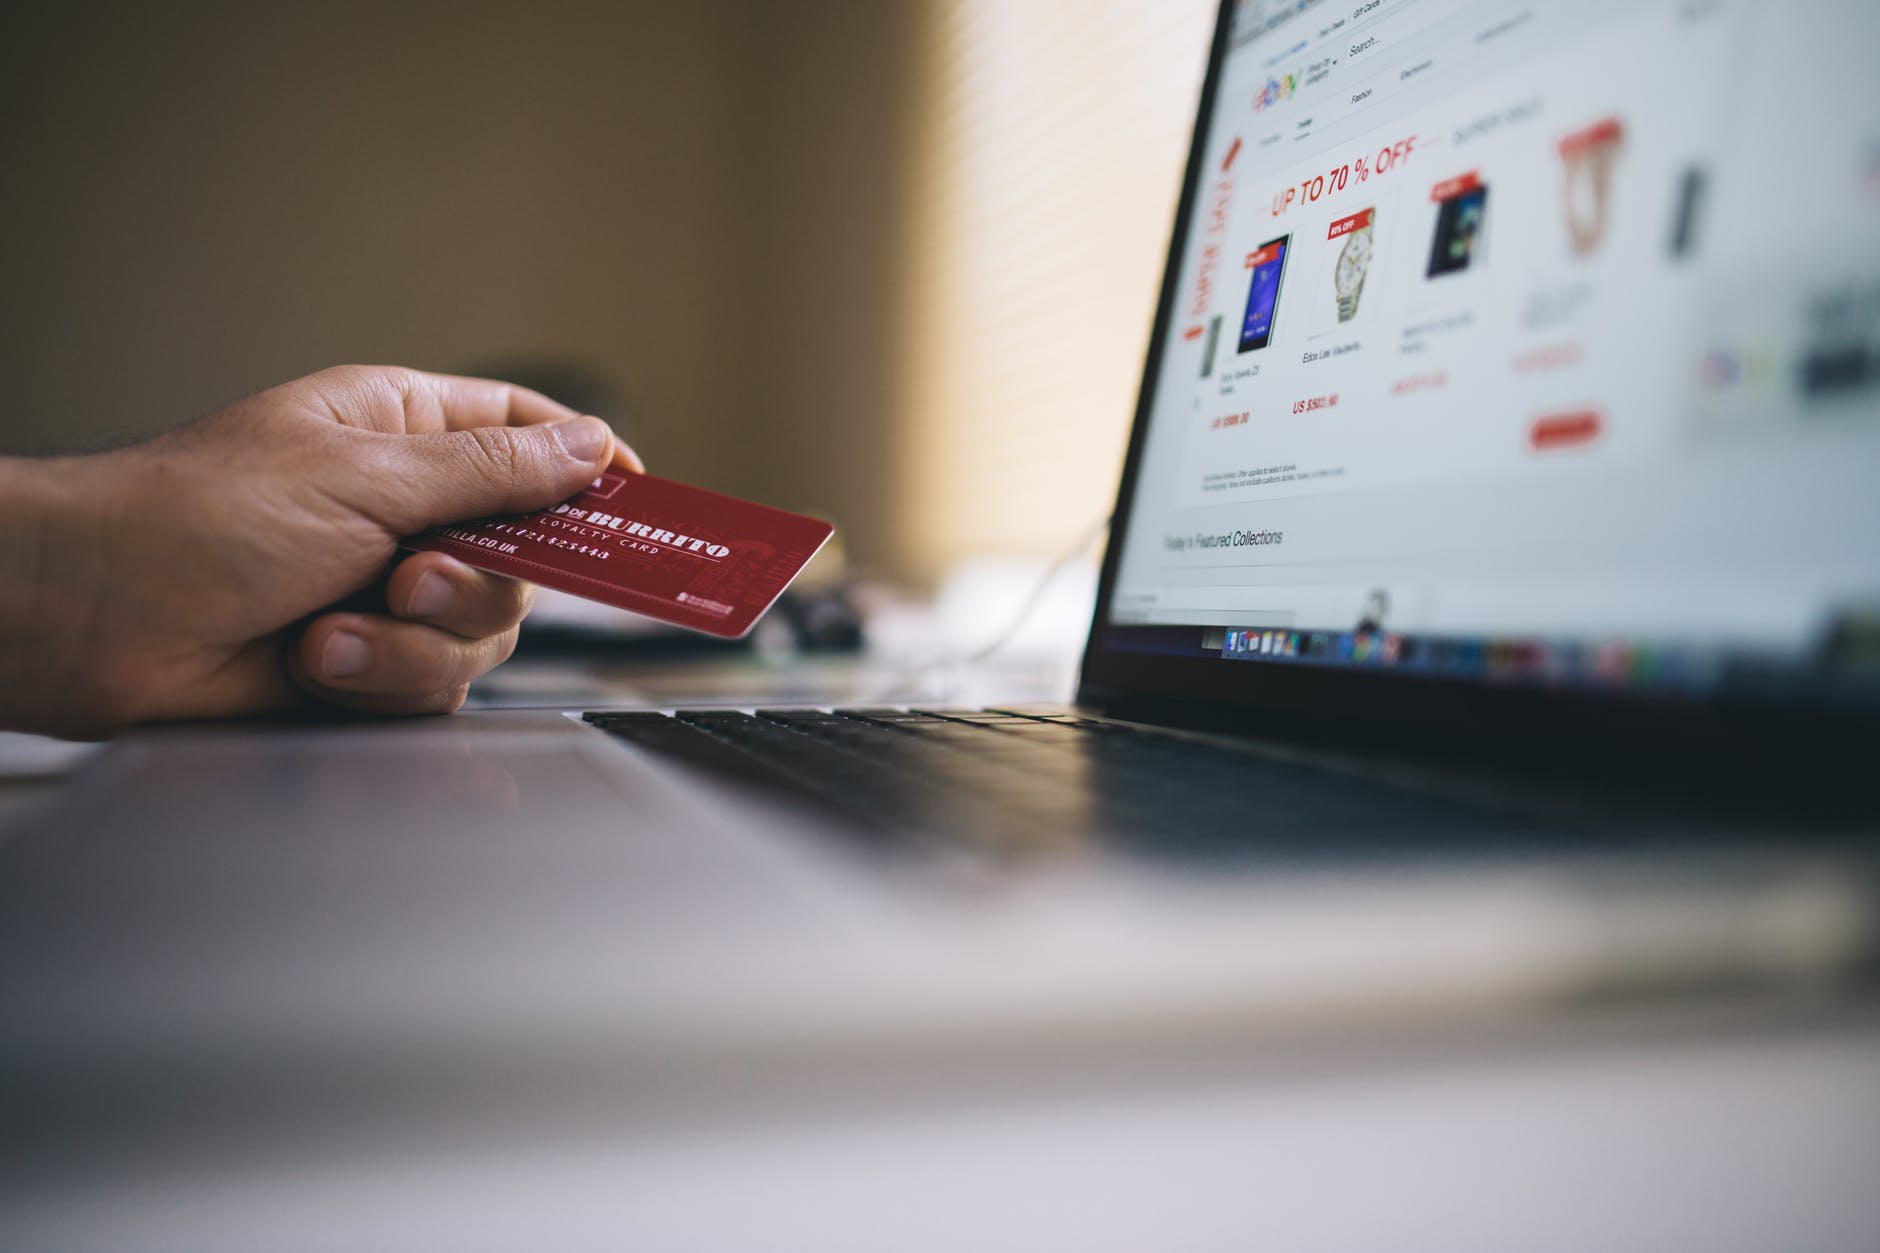 Digital Marketting, Online Promotion,Advertising